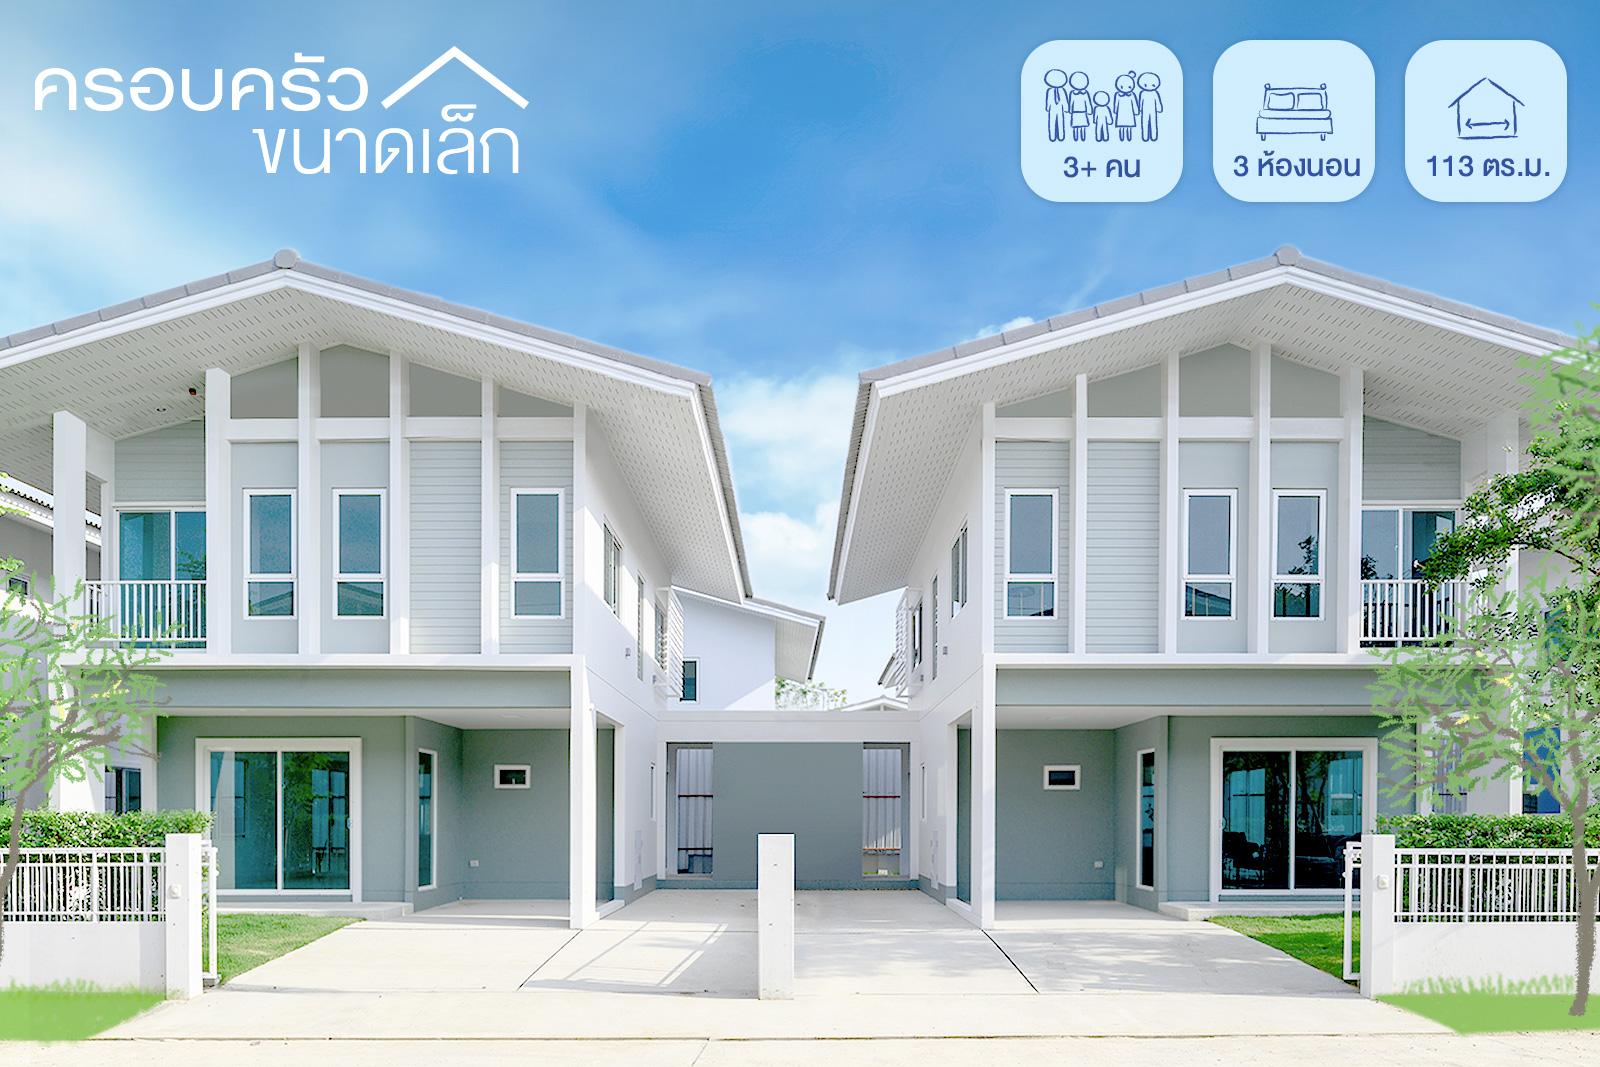 Kanasiri Rama 2-Wongwaen คณาสิริ พระราม 2-วงแหวน บ้านเดี่ยว